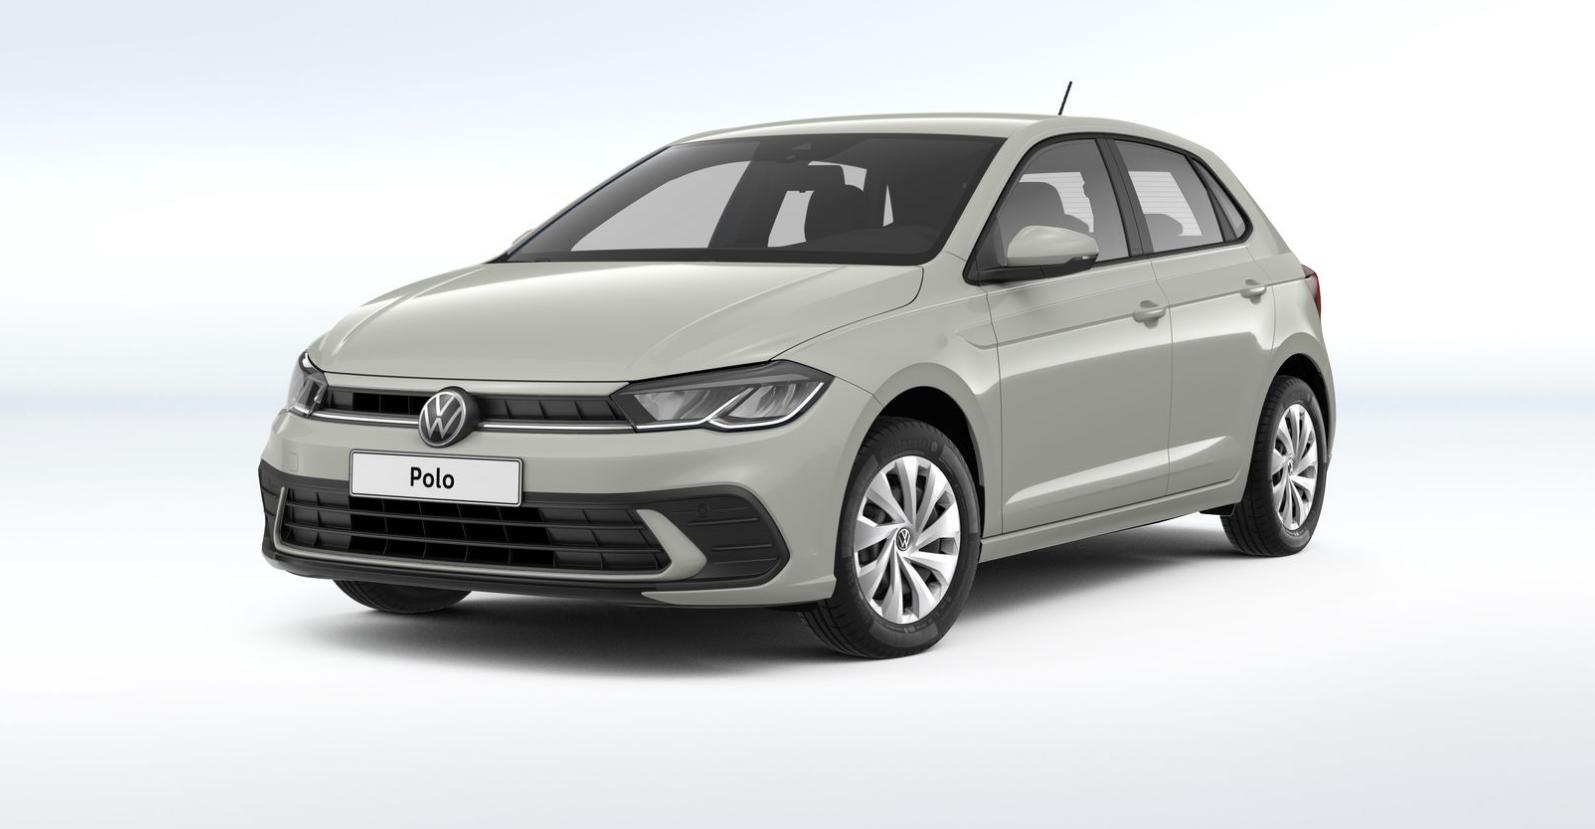 Volkswagen Polo 406.00 image